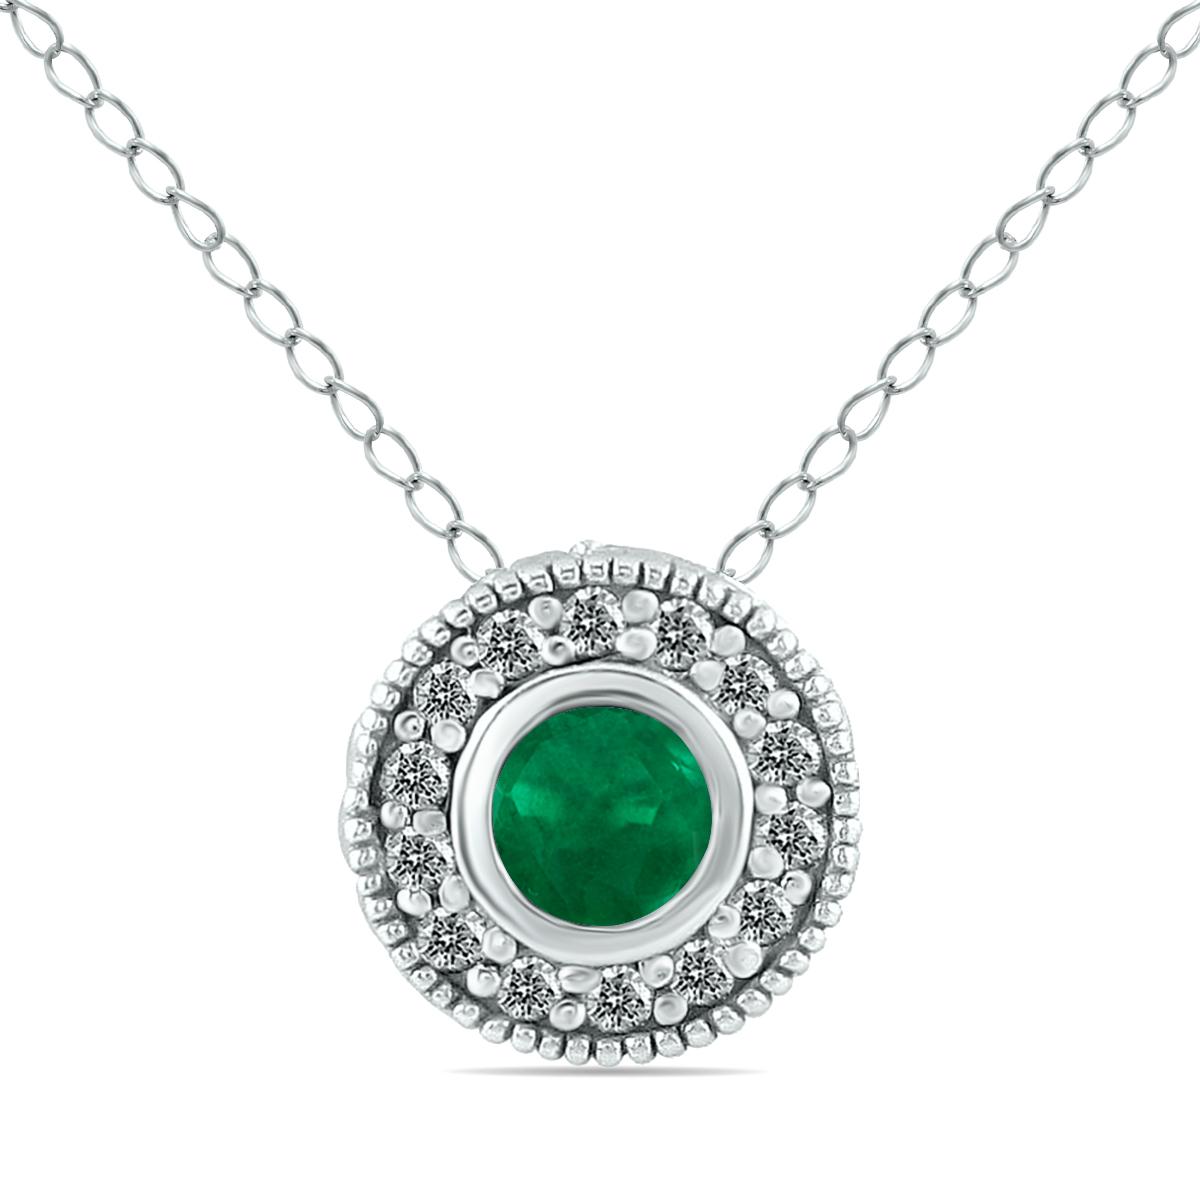 szul.com 1/6 CTW Diamond and Emerald Pendant in 10K White Gold at Sears.com